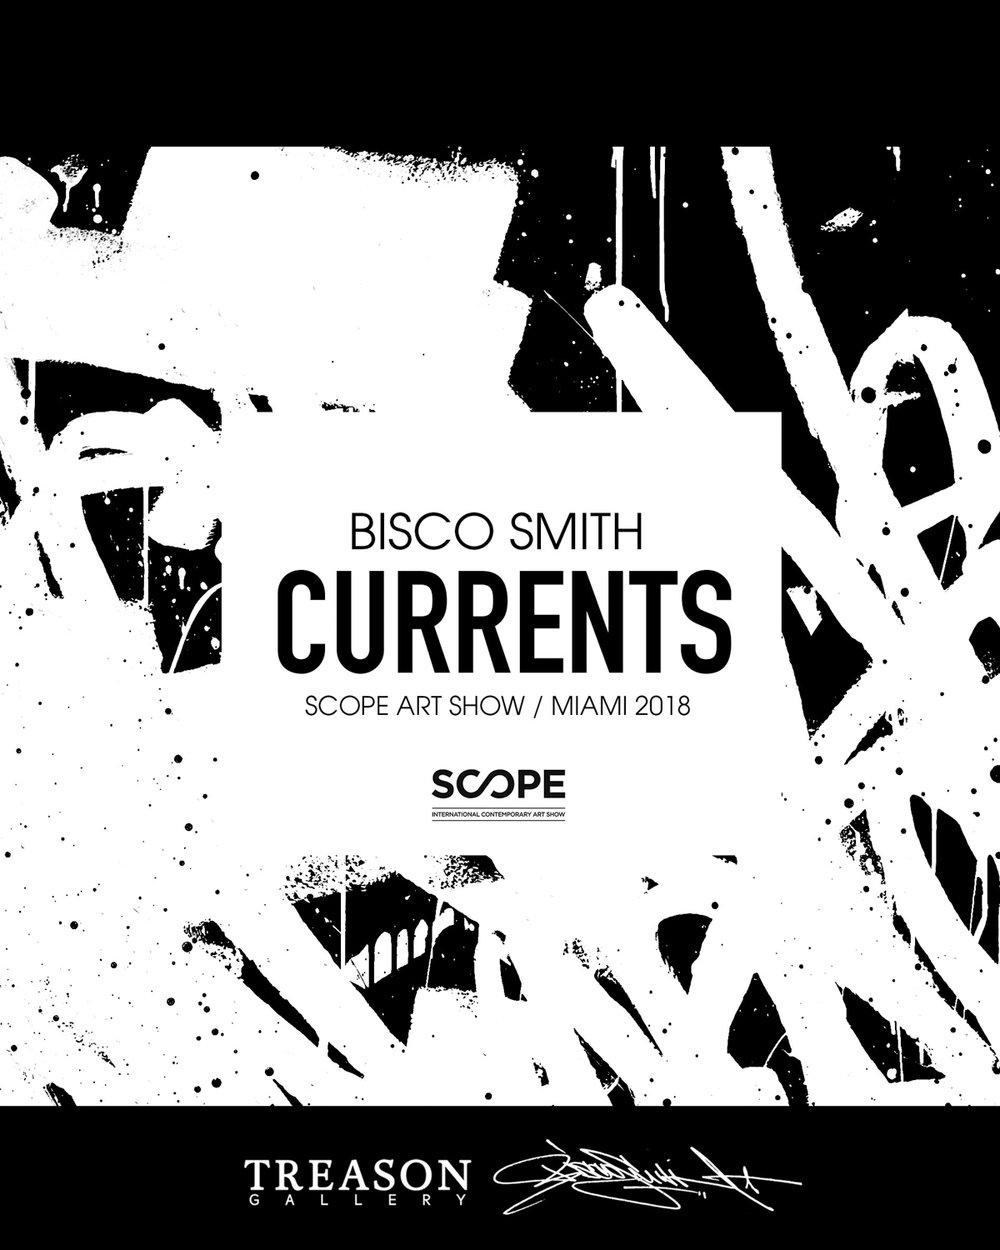 Currents - Bisco Smith - Scope- PROMOBLACK